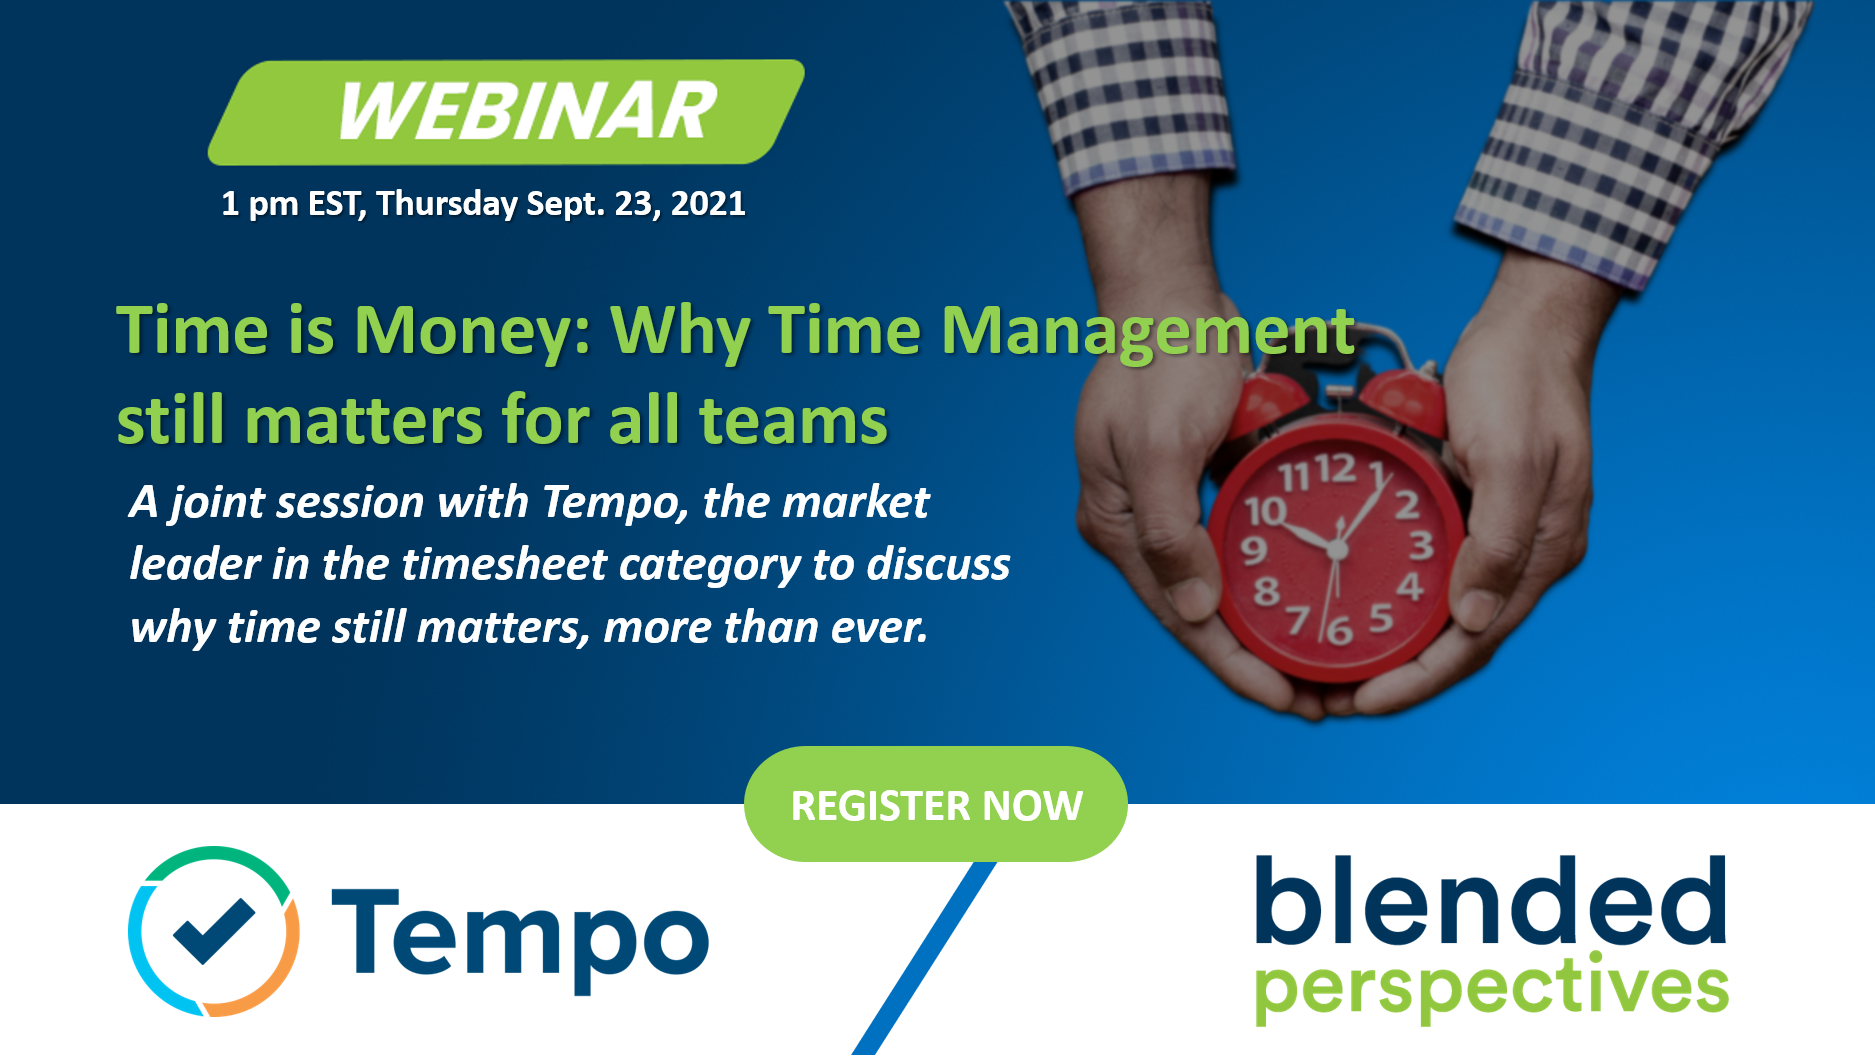 Tempo Webinar gestion du temps mixte